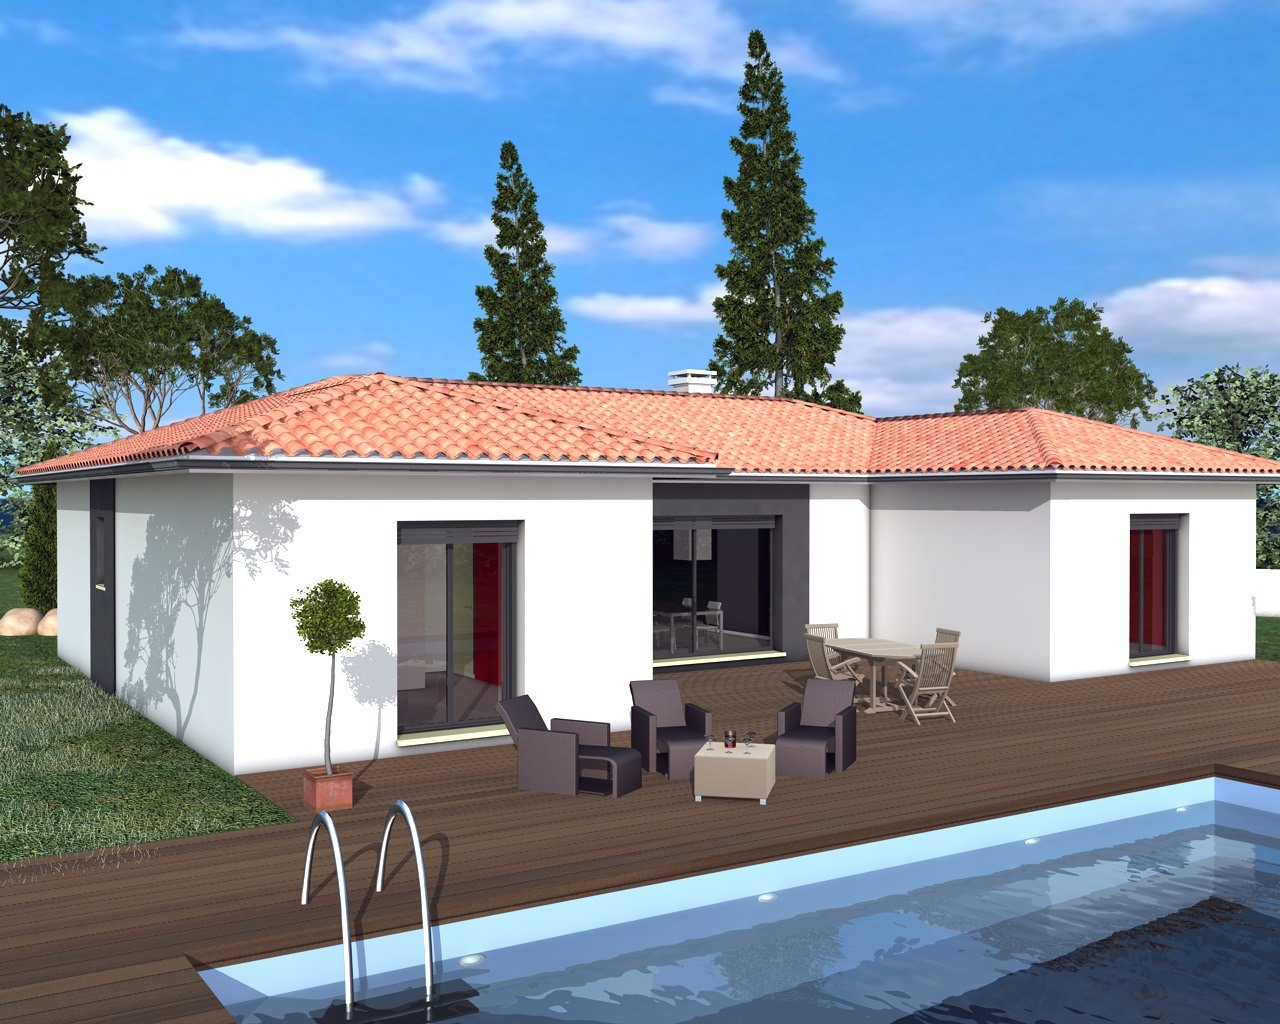 Emejing Maison Moderne Avec Garage Images - Transformatorio.us ...